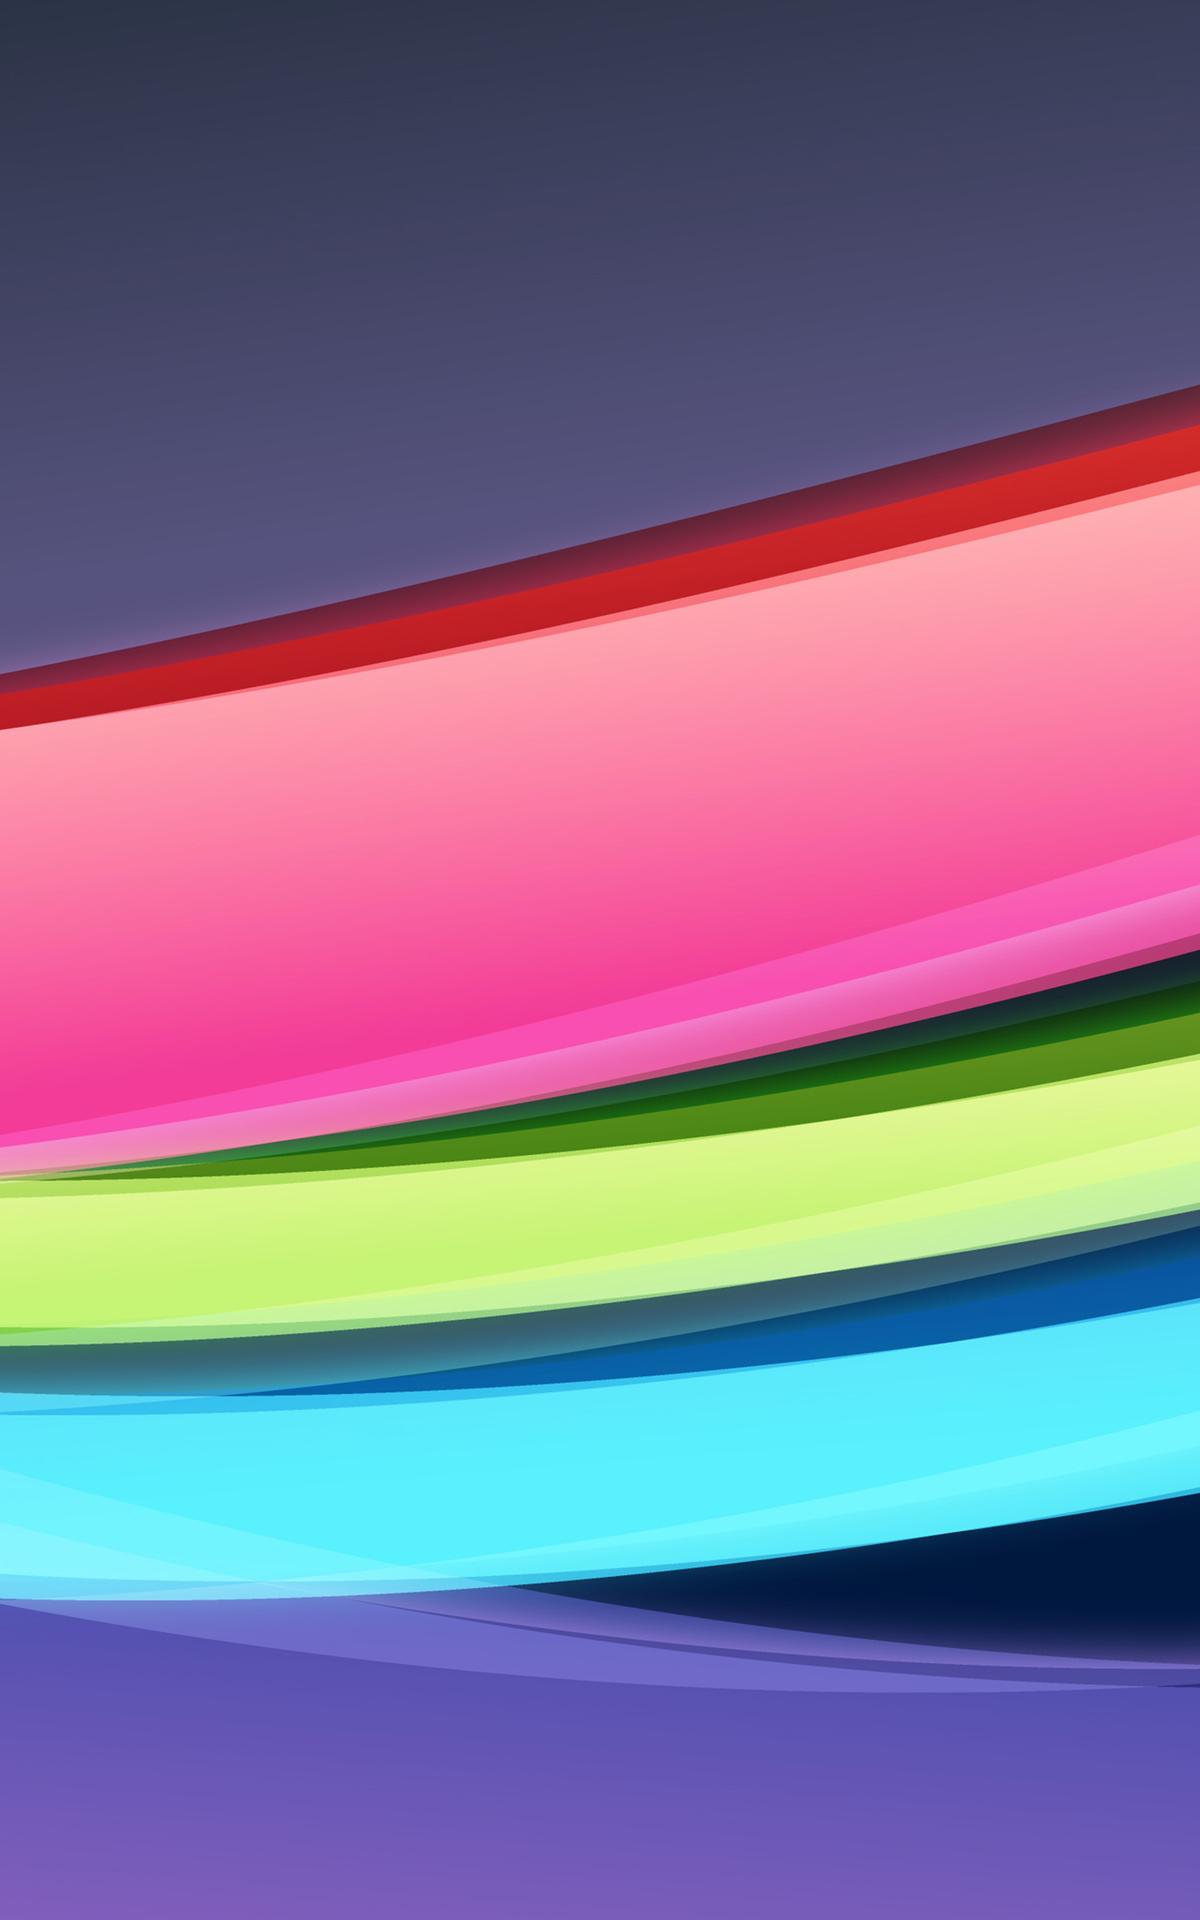 Wallpapers Google Nexus 7   Pack 003   WallsPhone 1200x1920